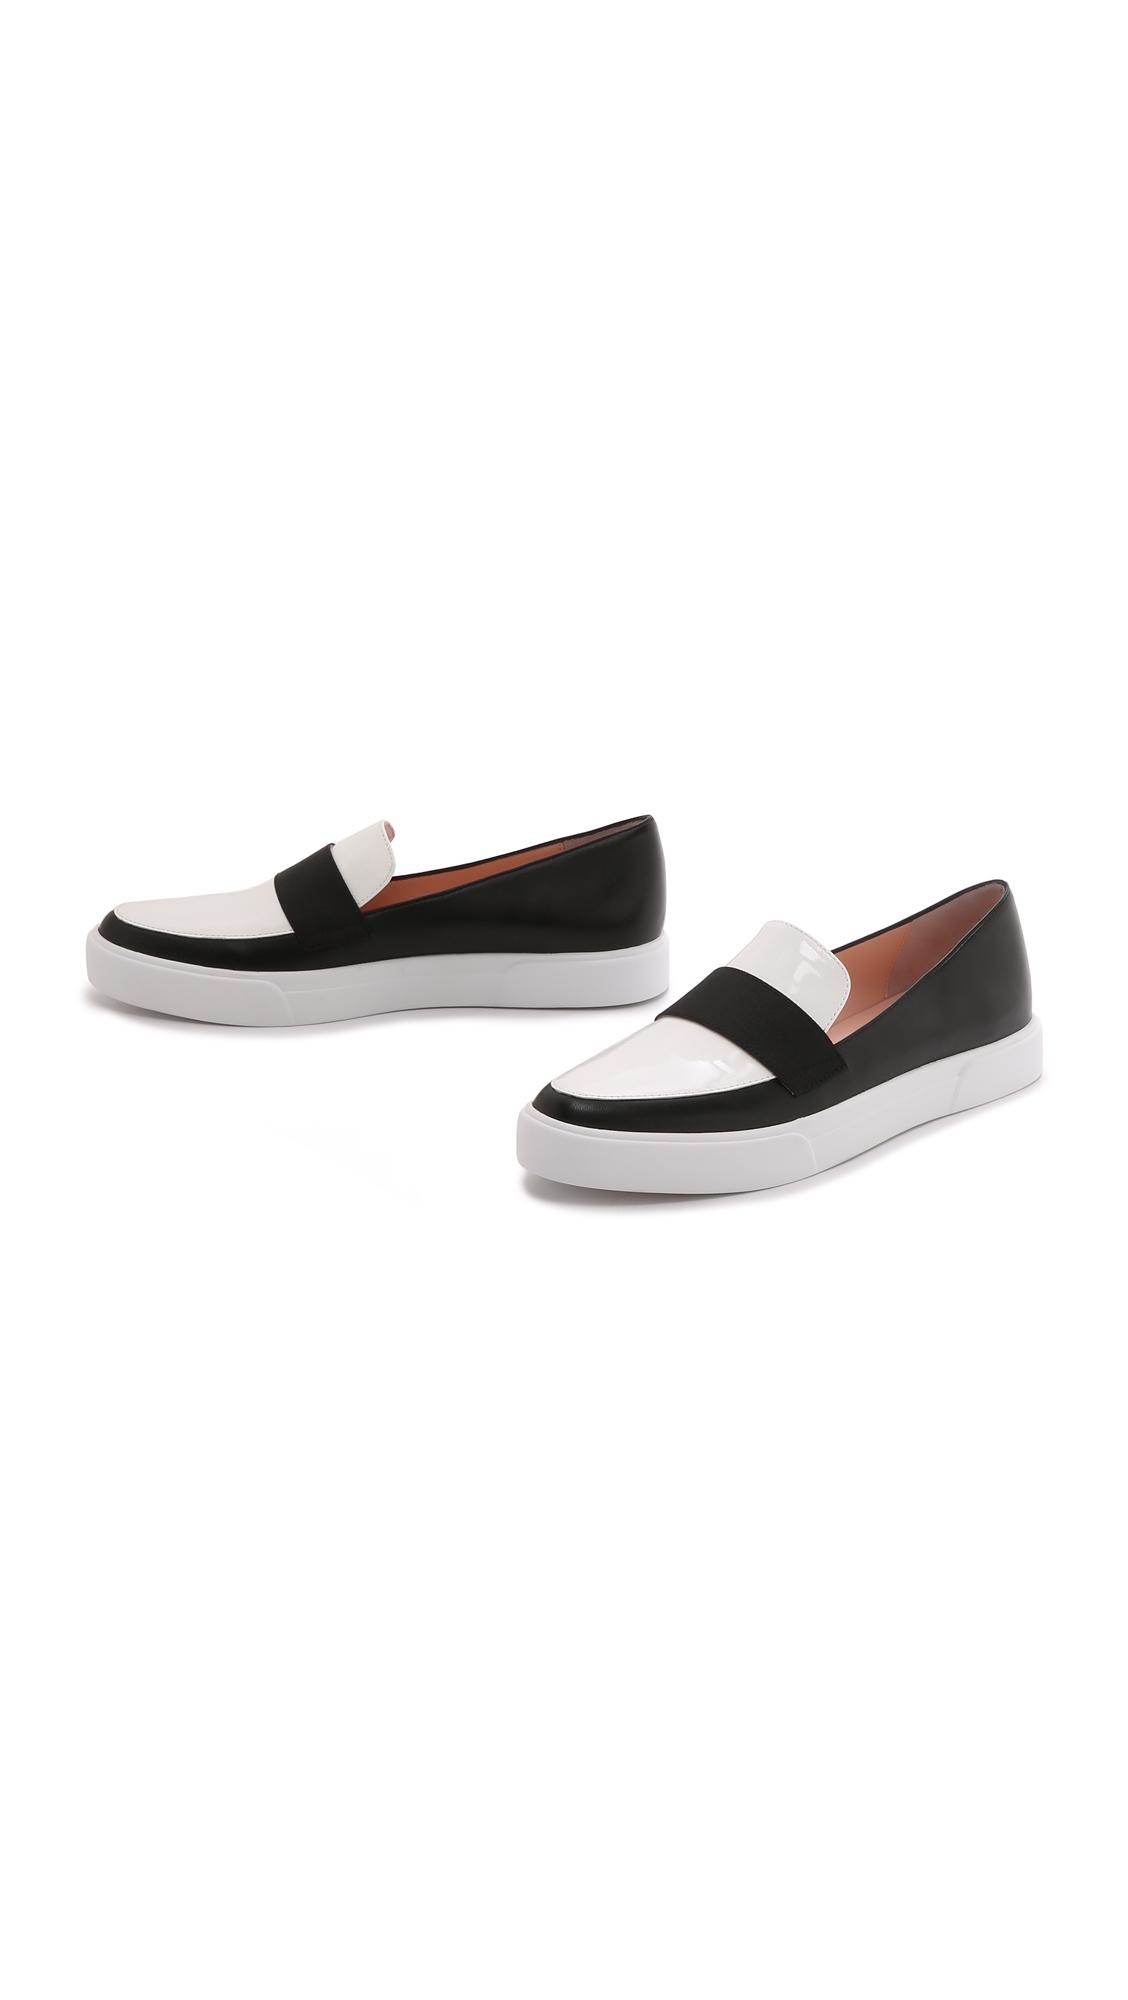 kate spade new york clove slip on sneakers black white